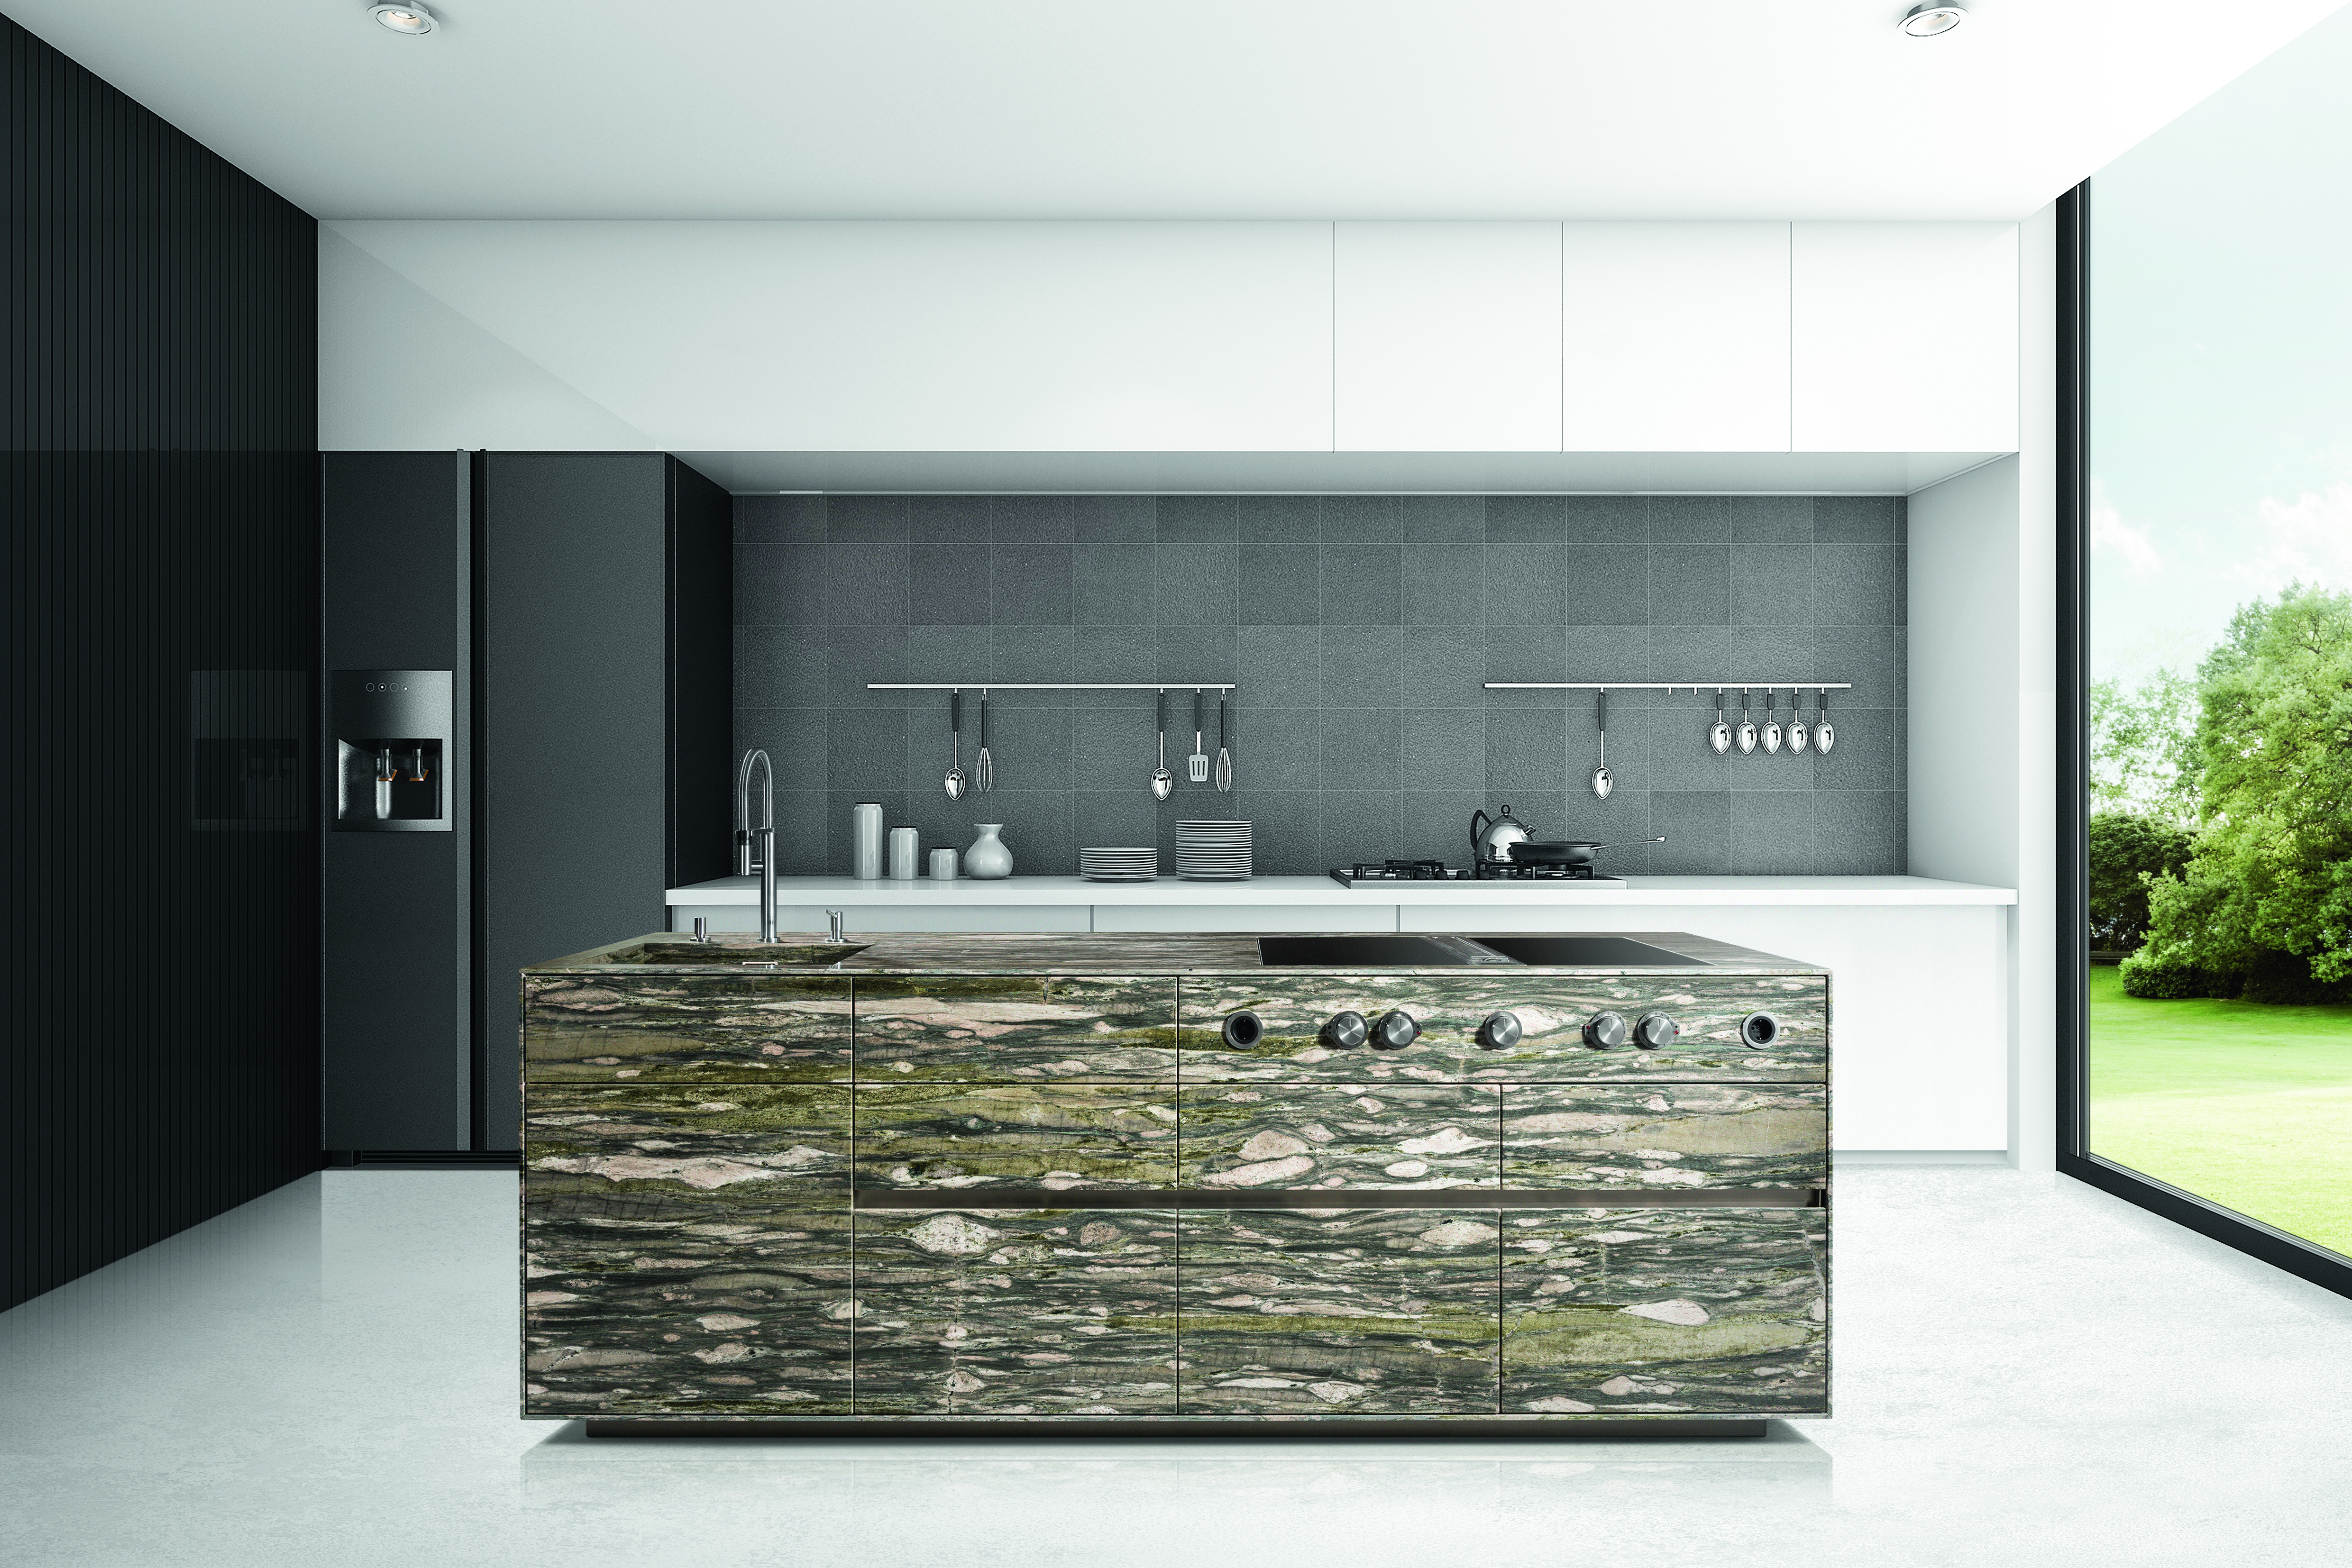 Fabulous Arbeitsplatte aus Naturstein – das muss man beachten FF91